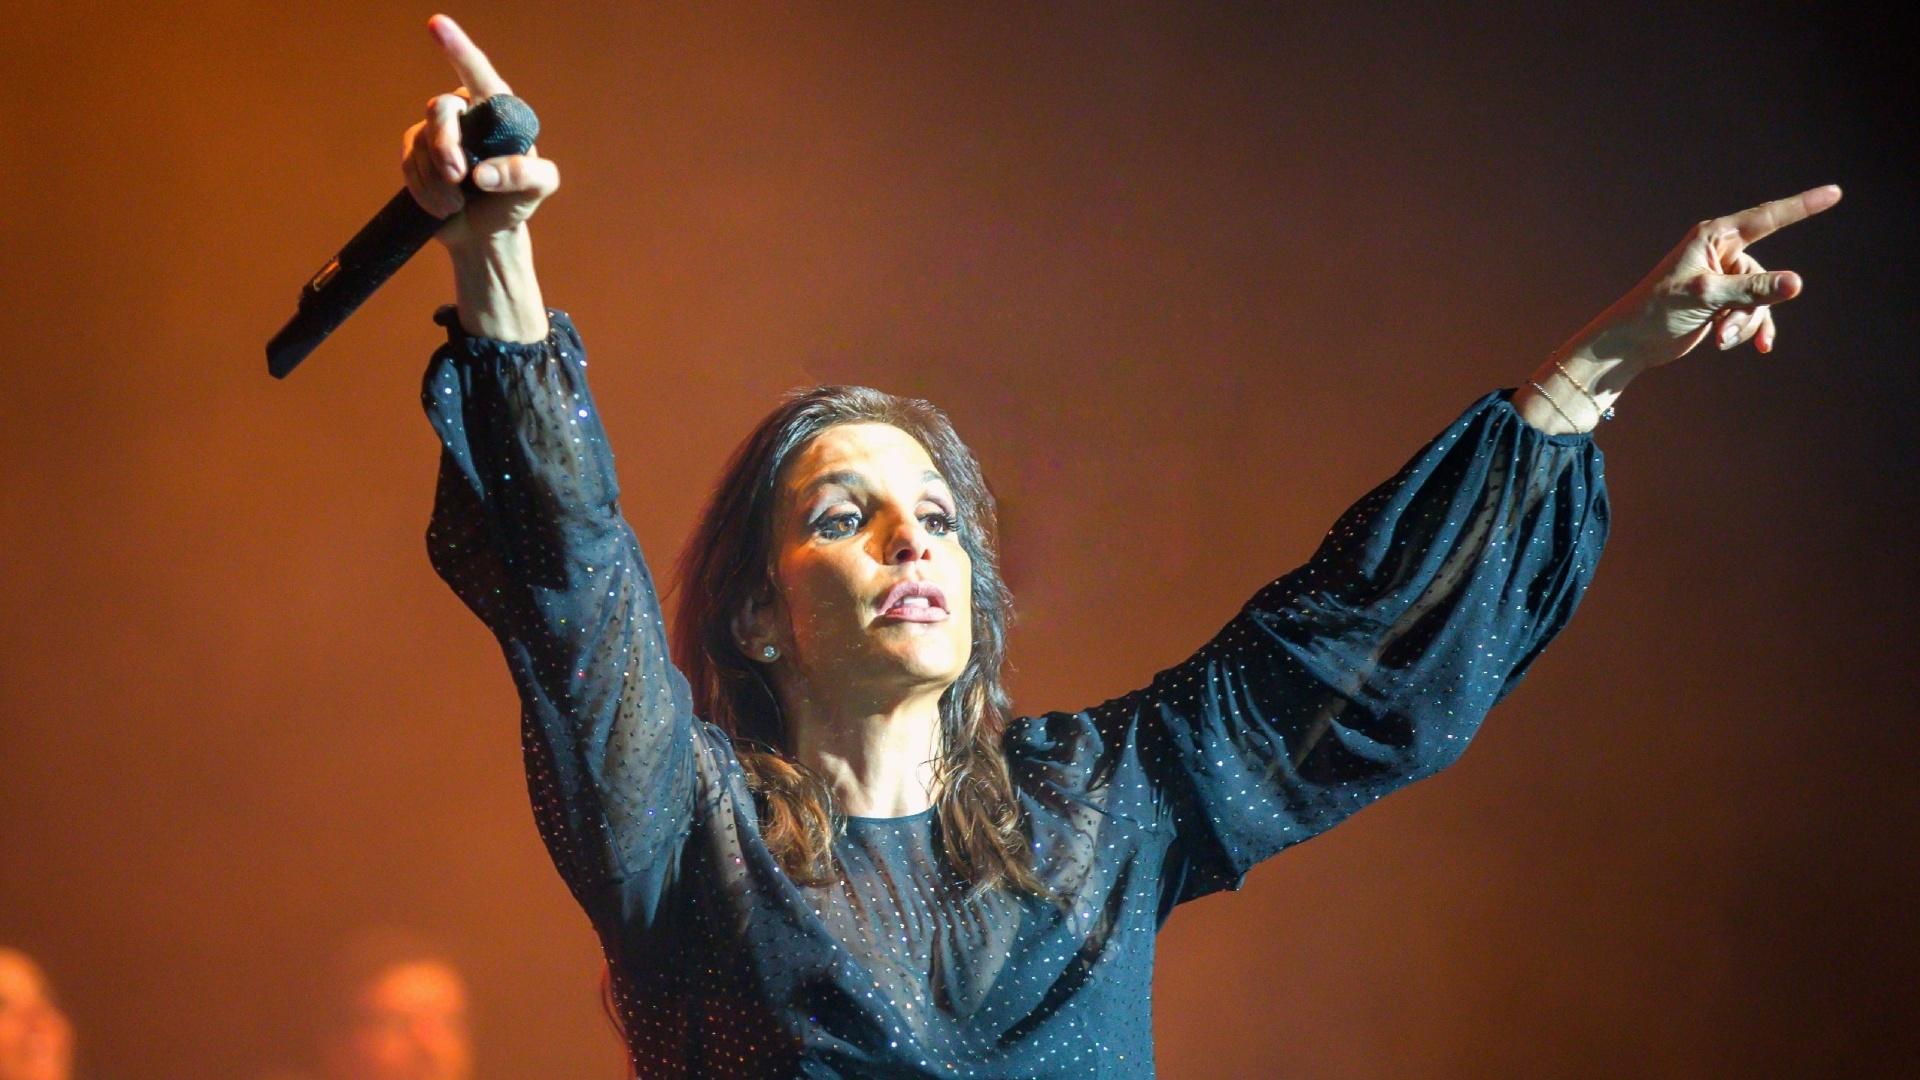 16.ago.2013 - Ivete Sangalo apresenta show Real Fantasia no Lynn Auditorium na cidade de Lynn, nos EUA